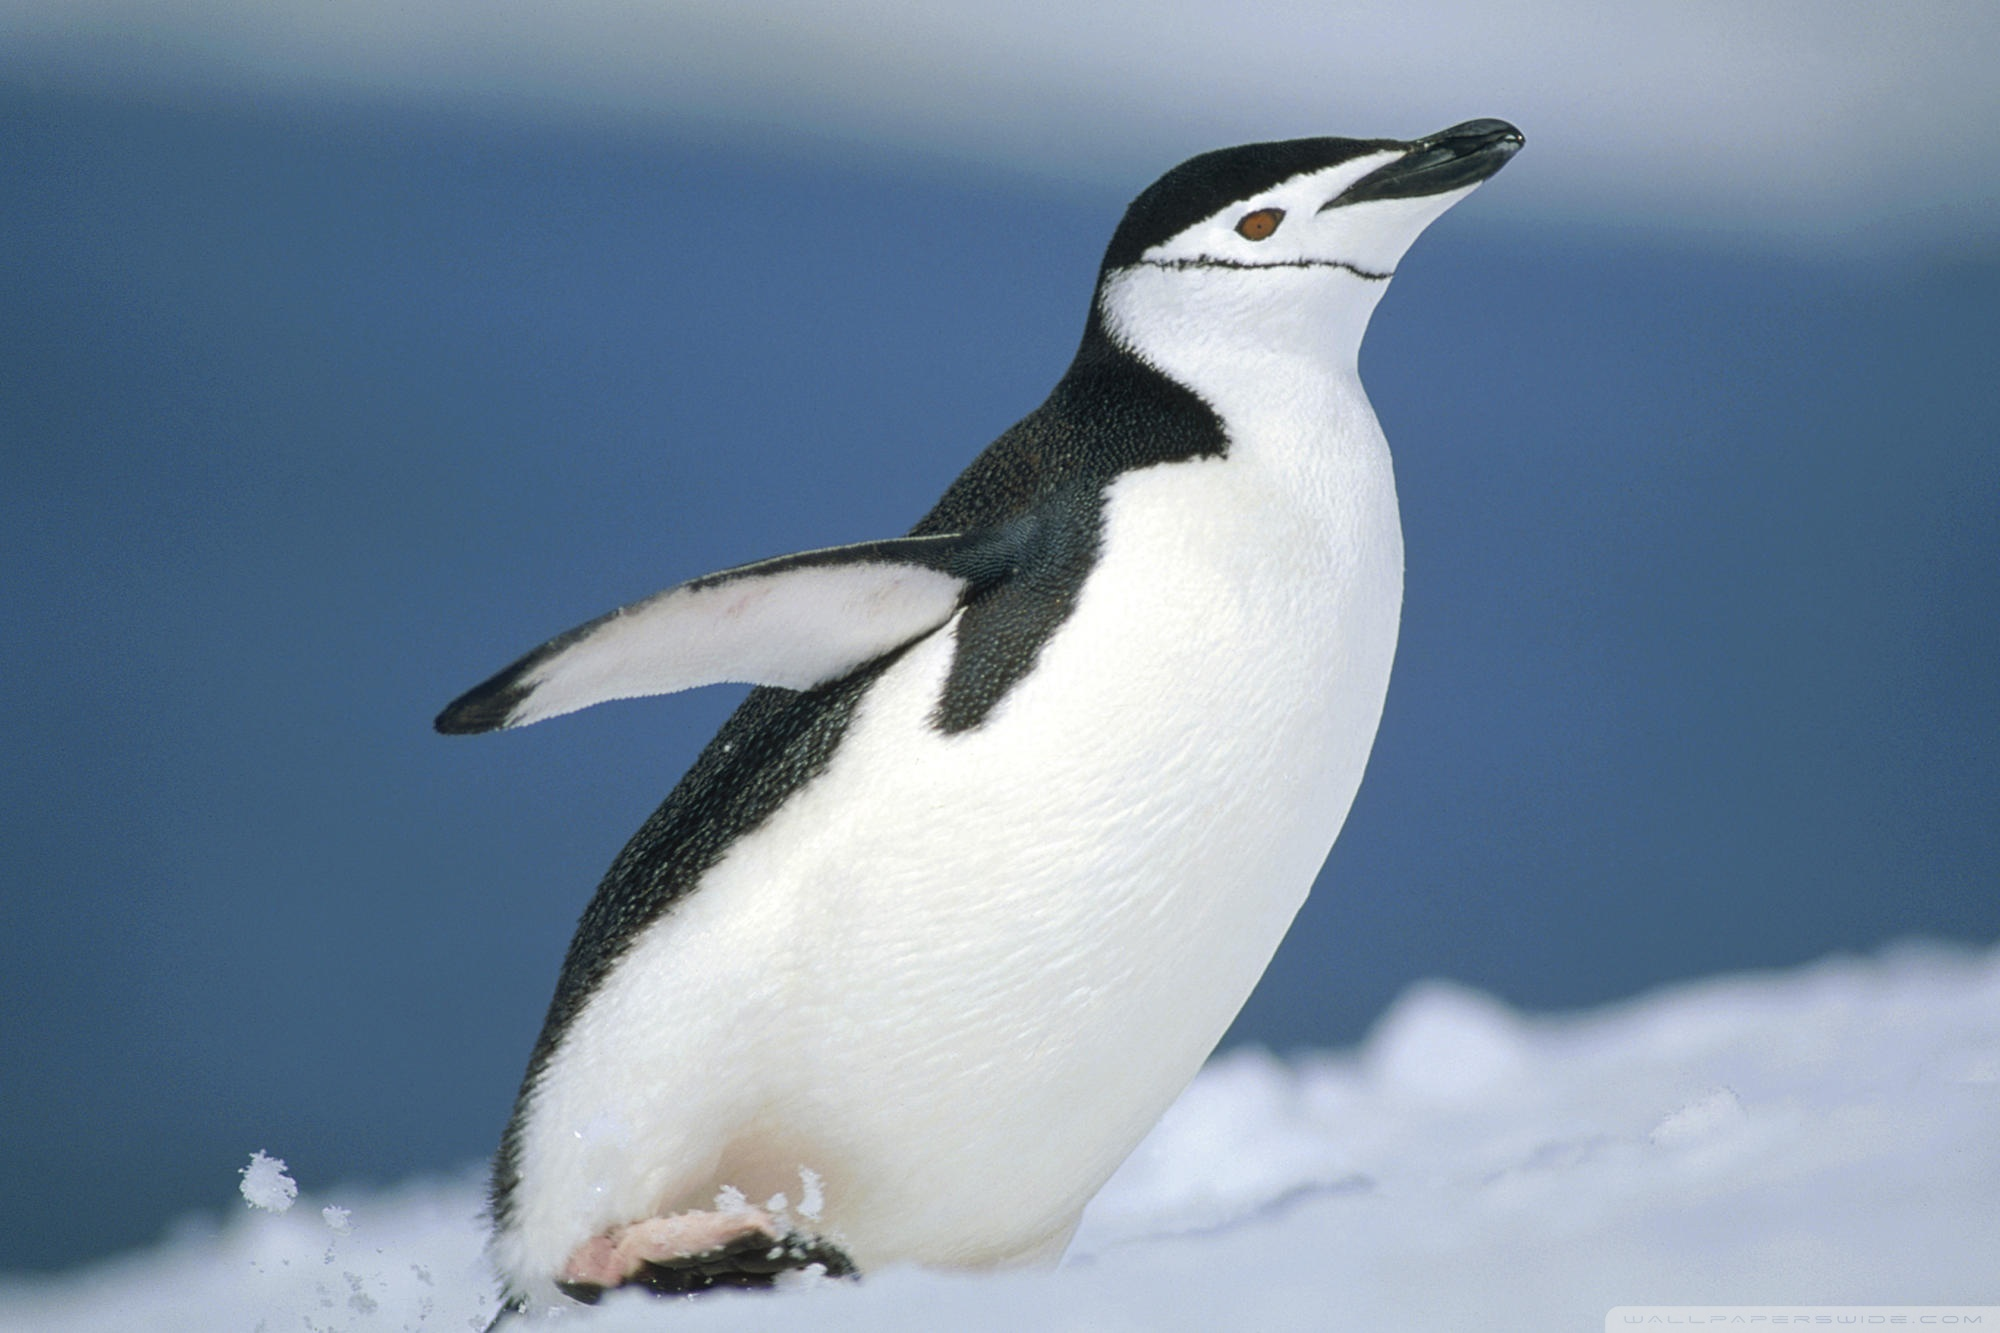 Cute little penguin photography wallpaper Animal desktop background 2000x1333